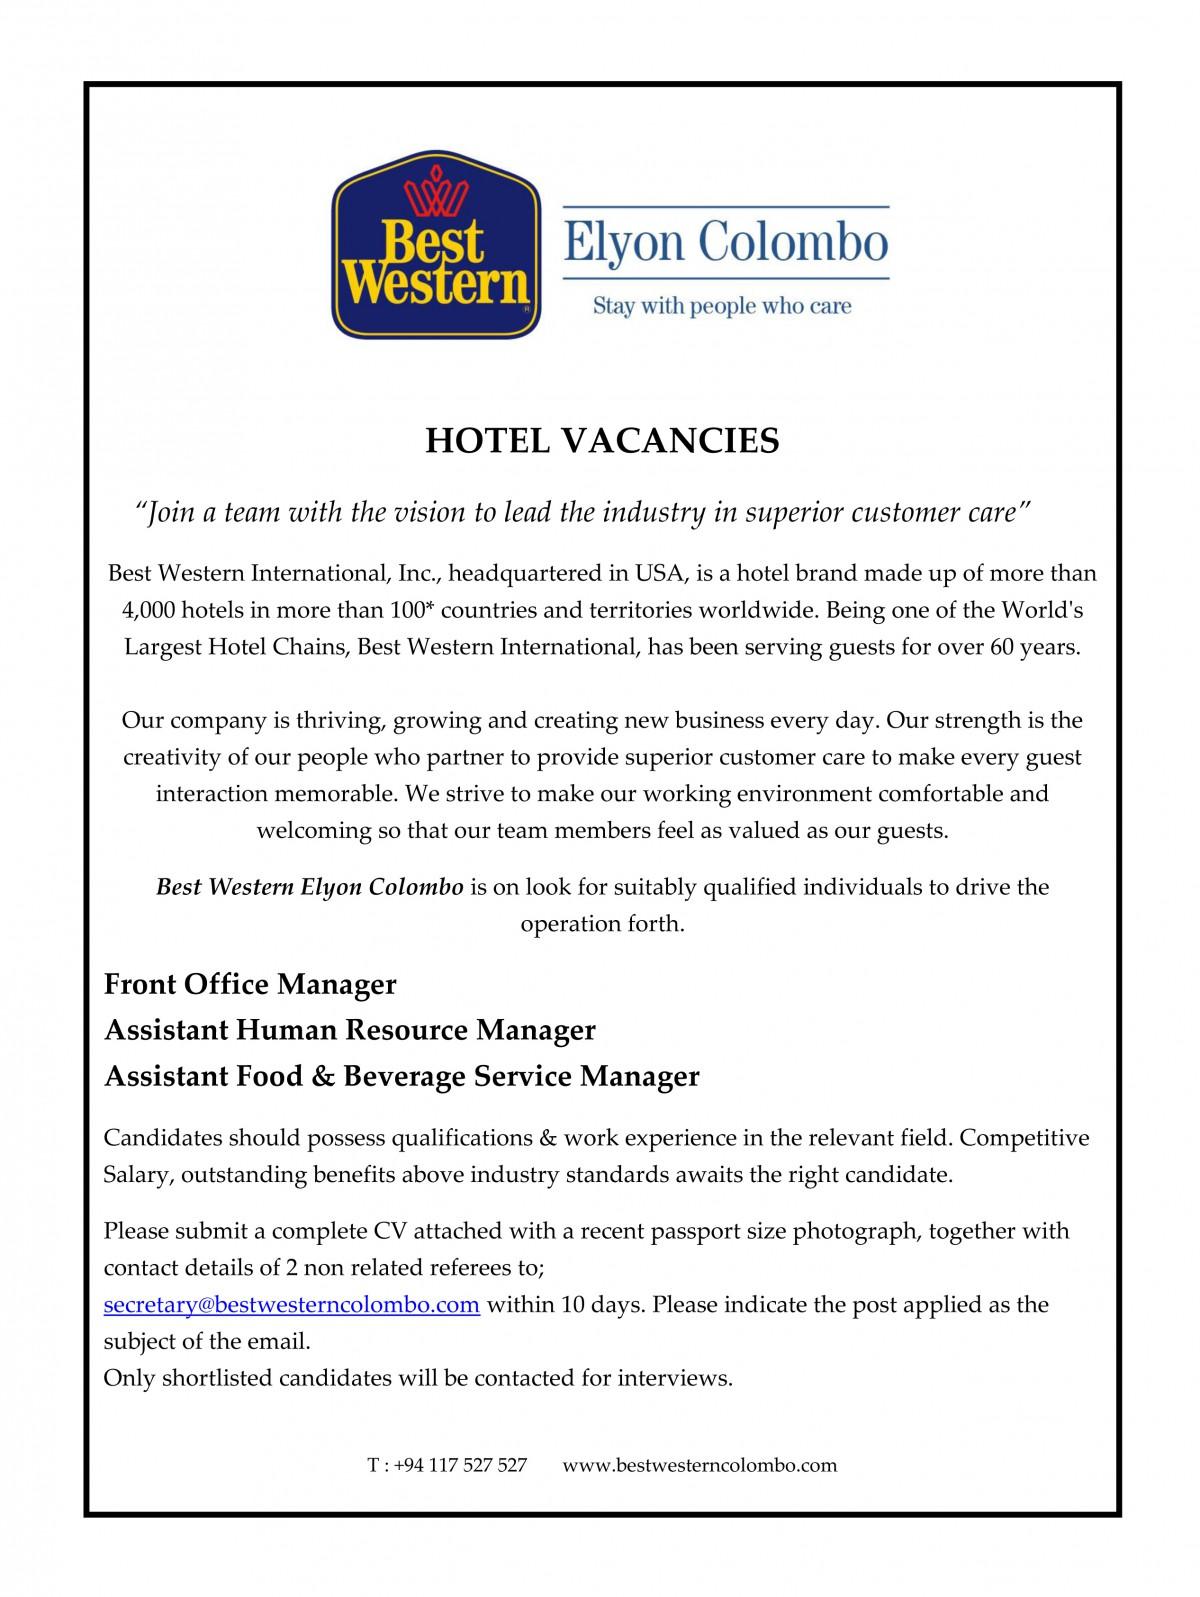 Hotel Vacancies At Best Western Elyon Colombo